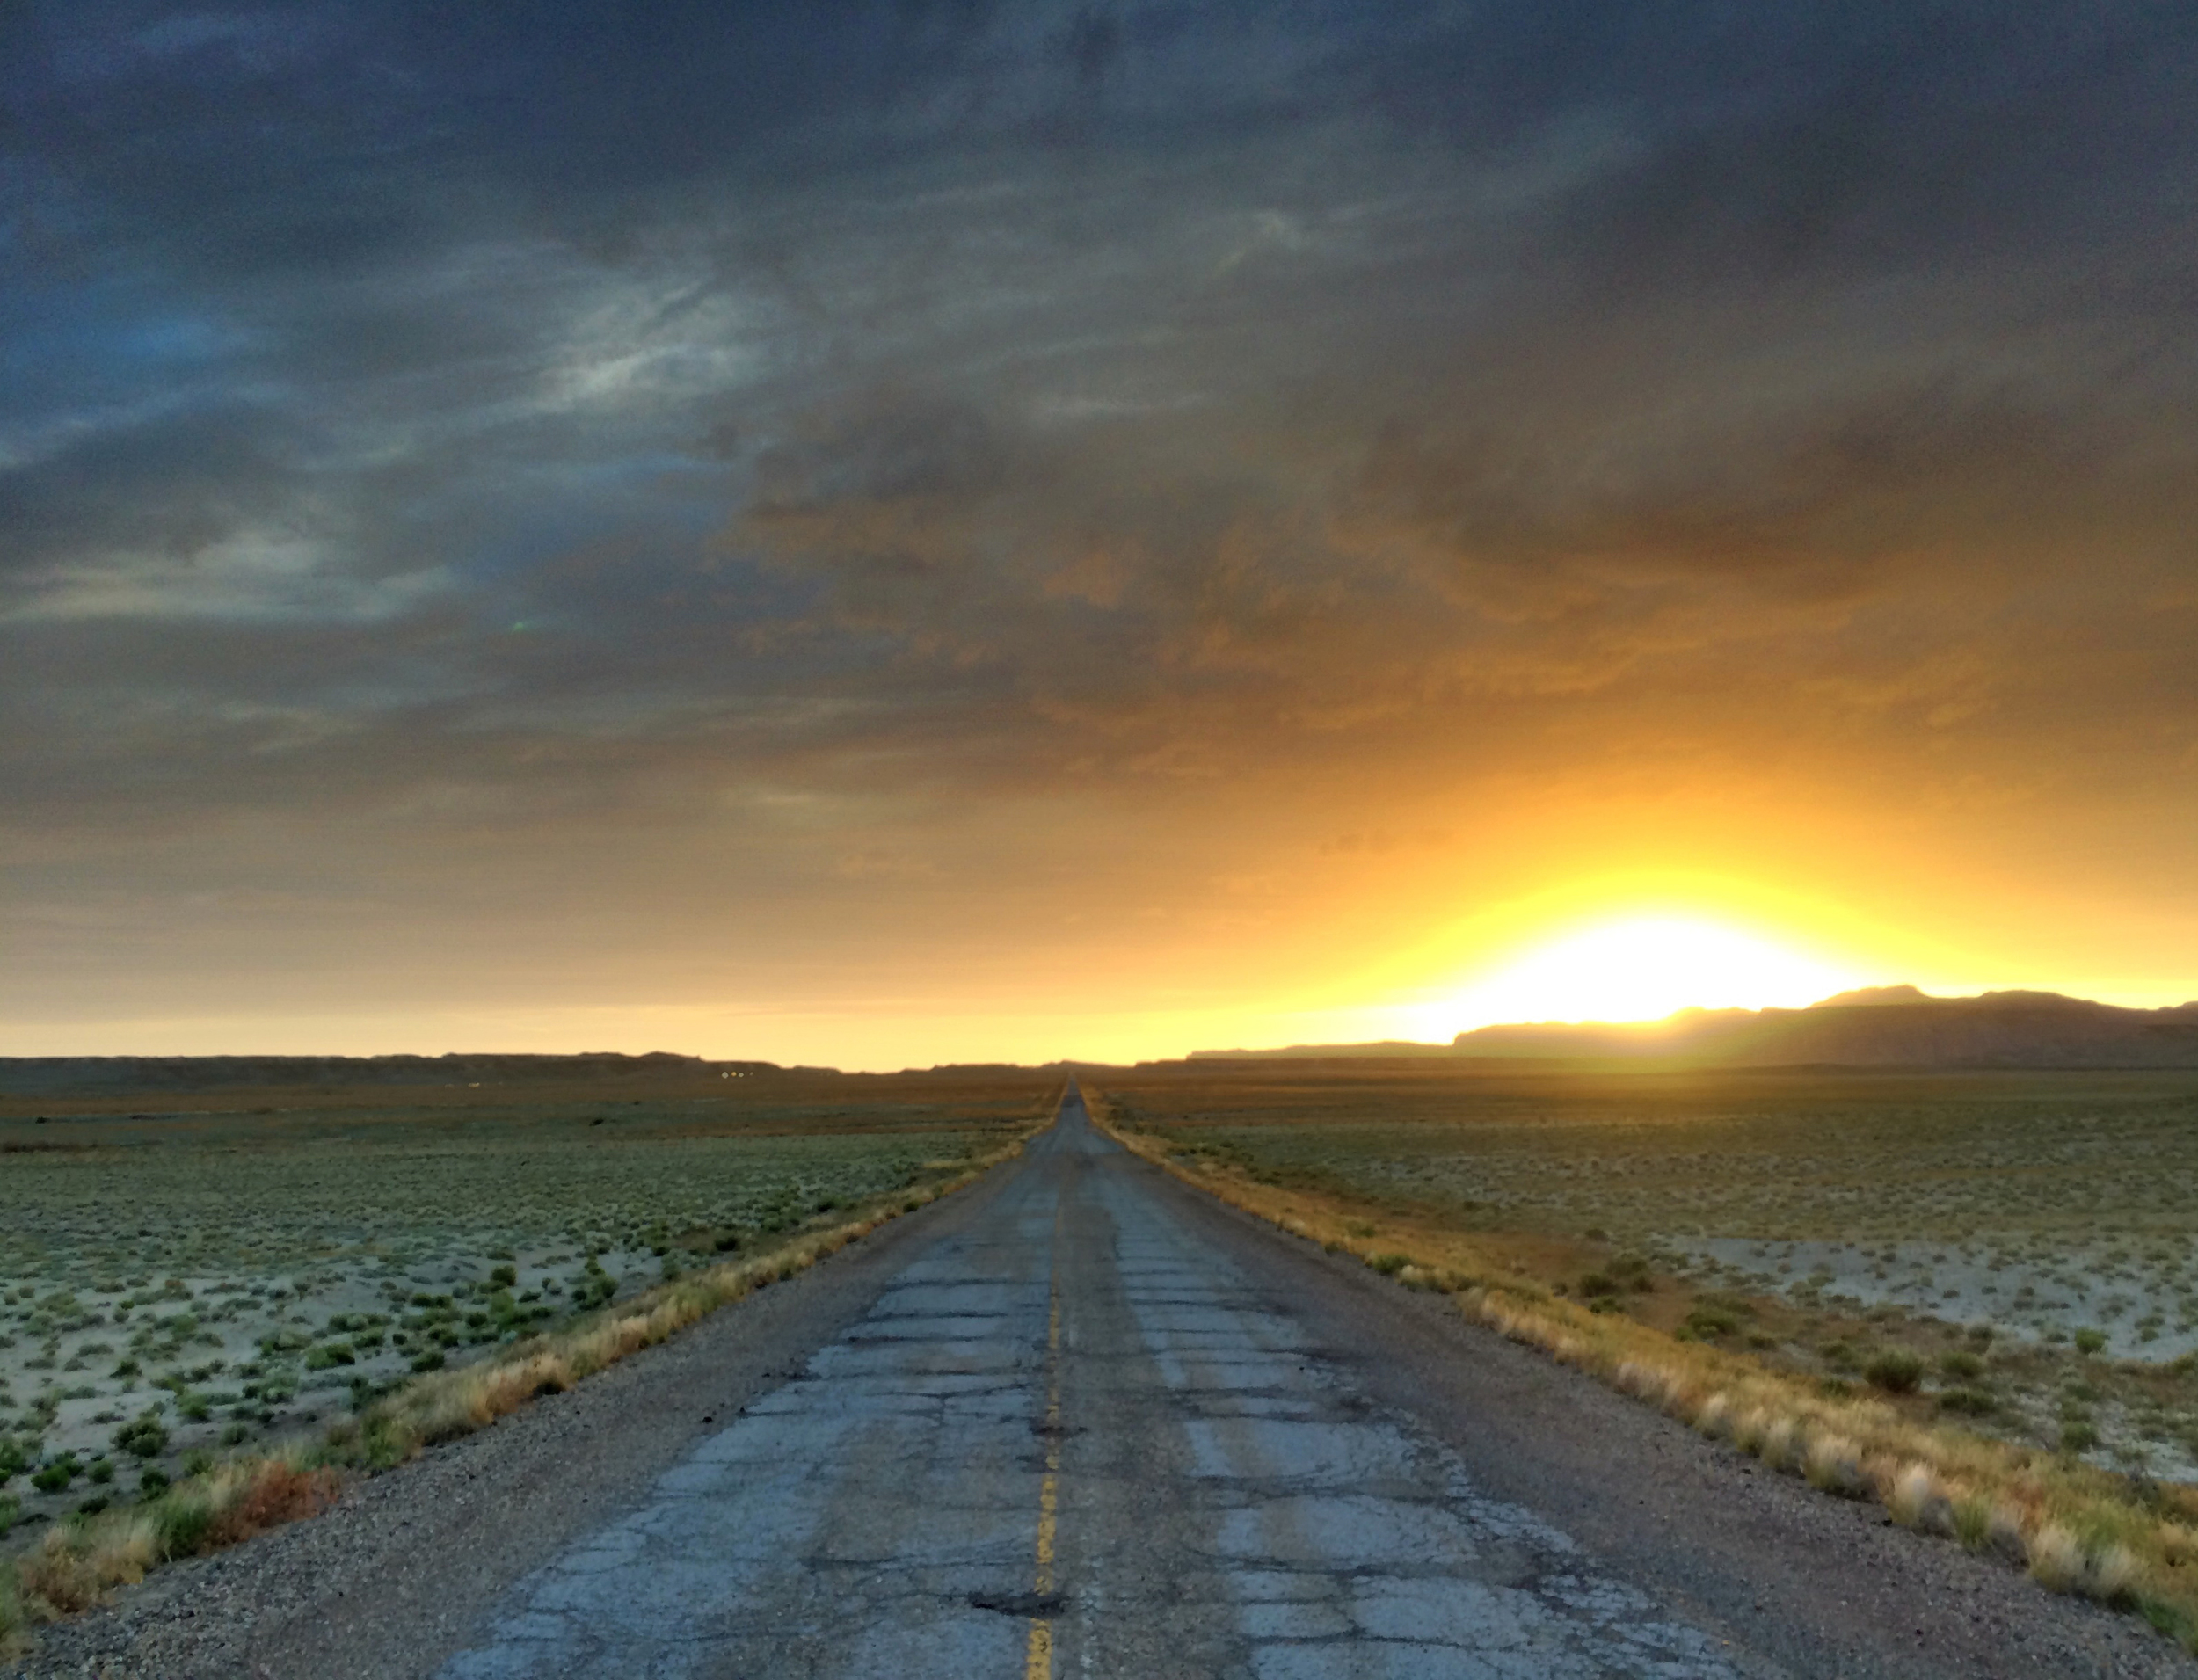 LONESOME HIGHWAY : Taken somewhere in between Colorado and Utah.